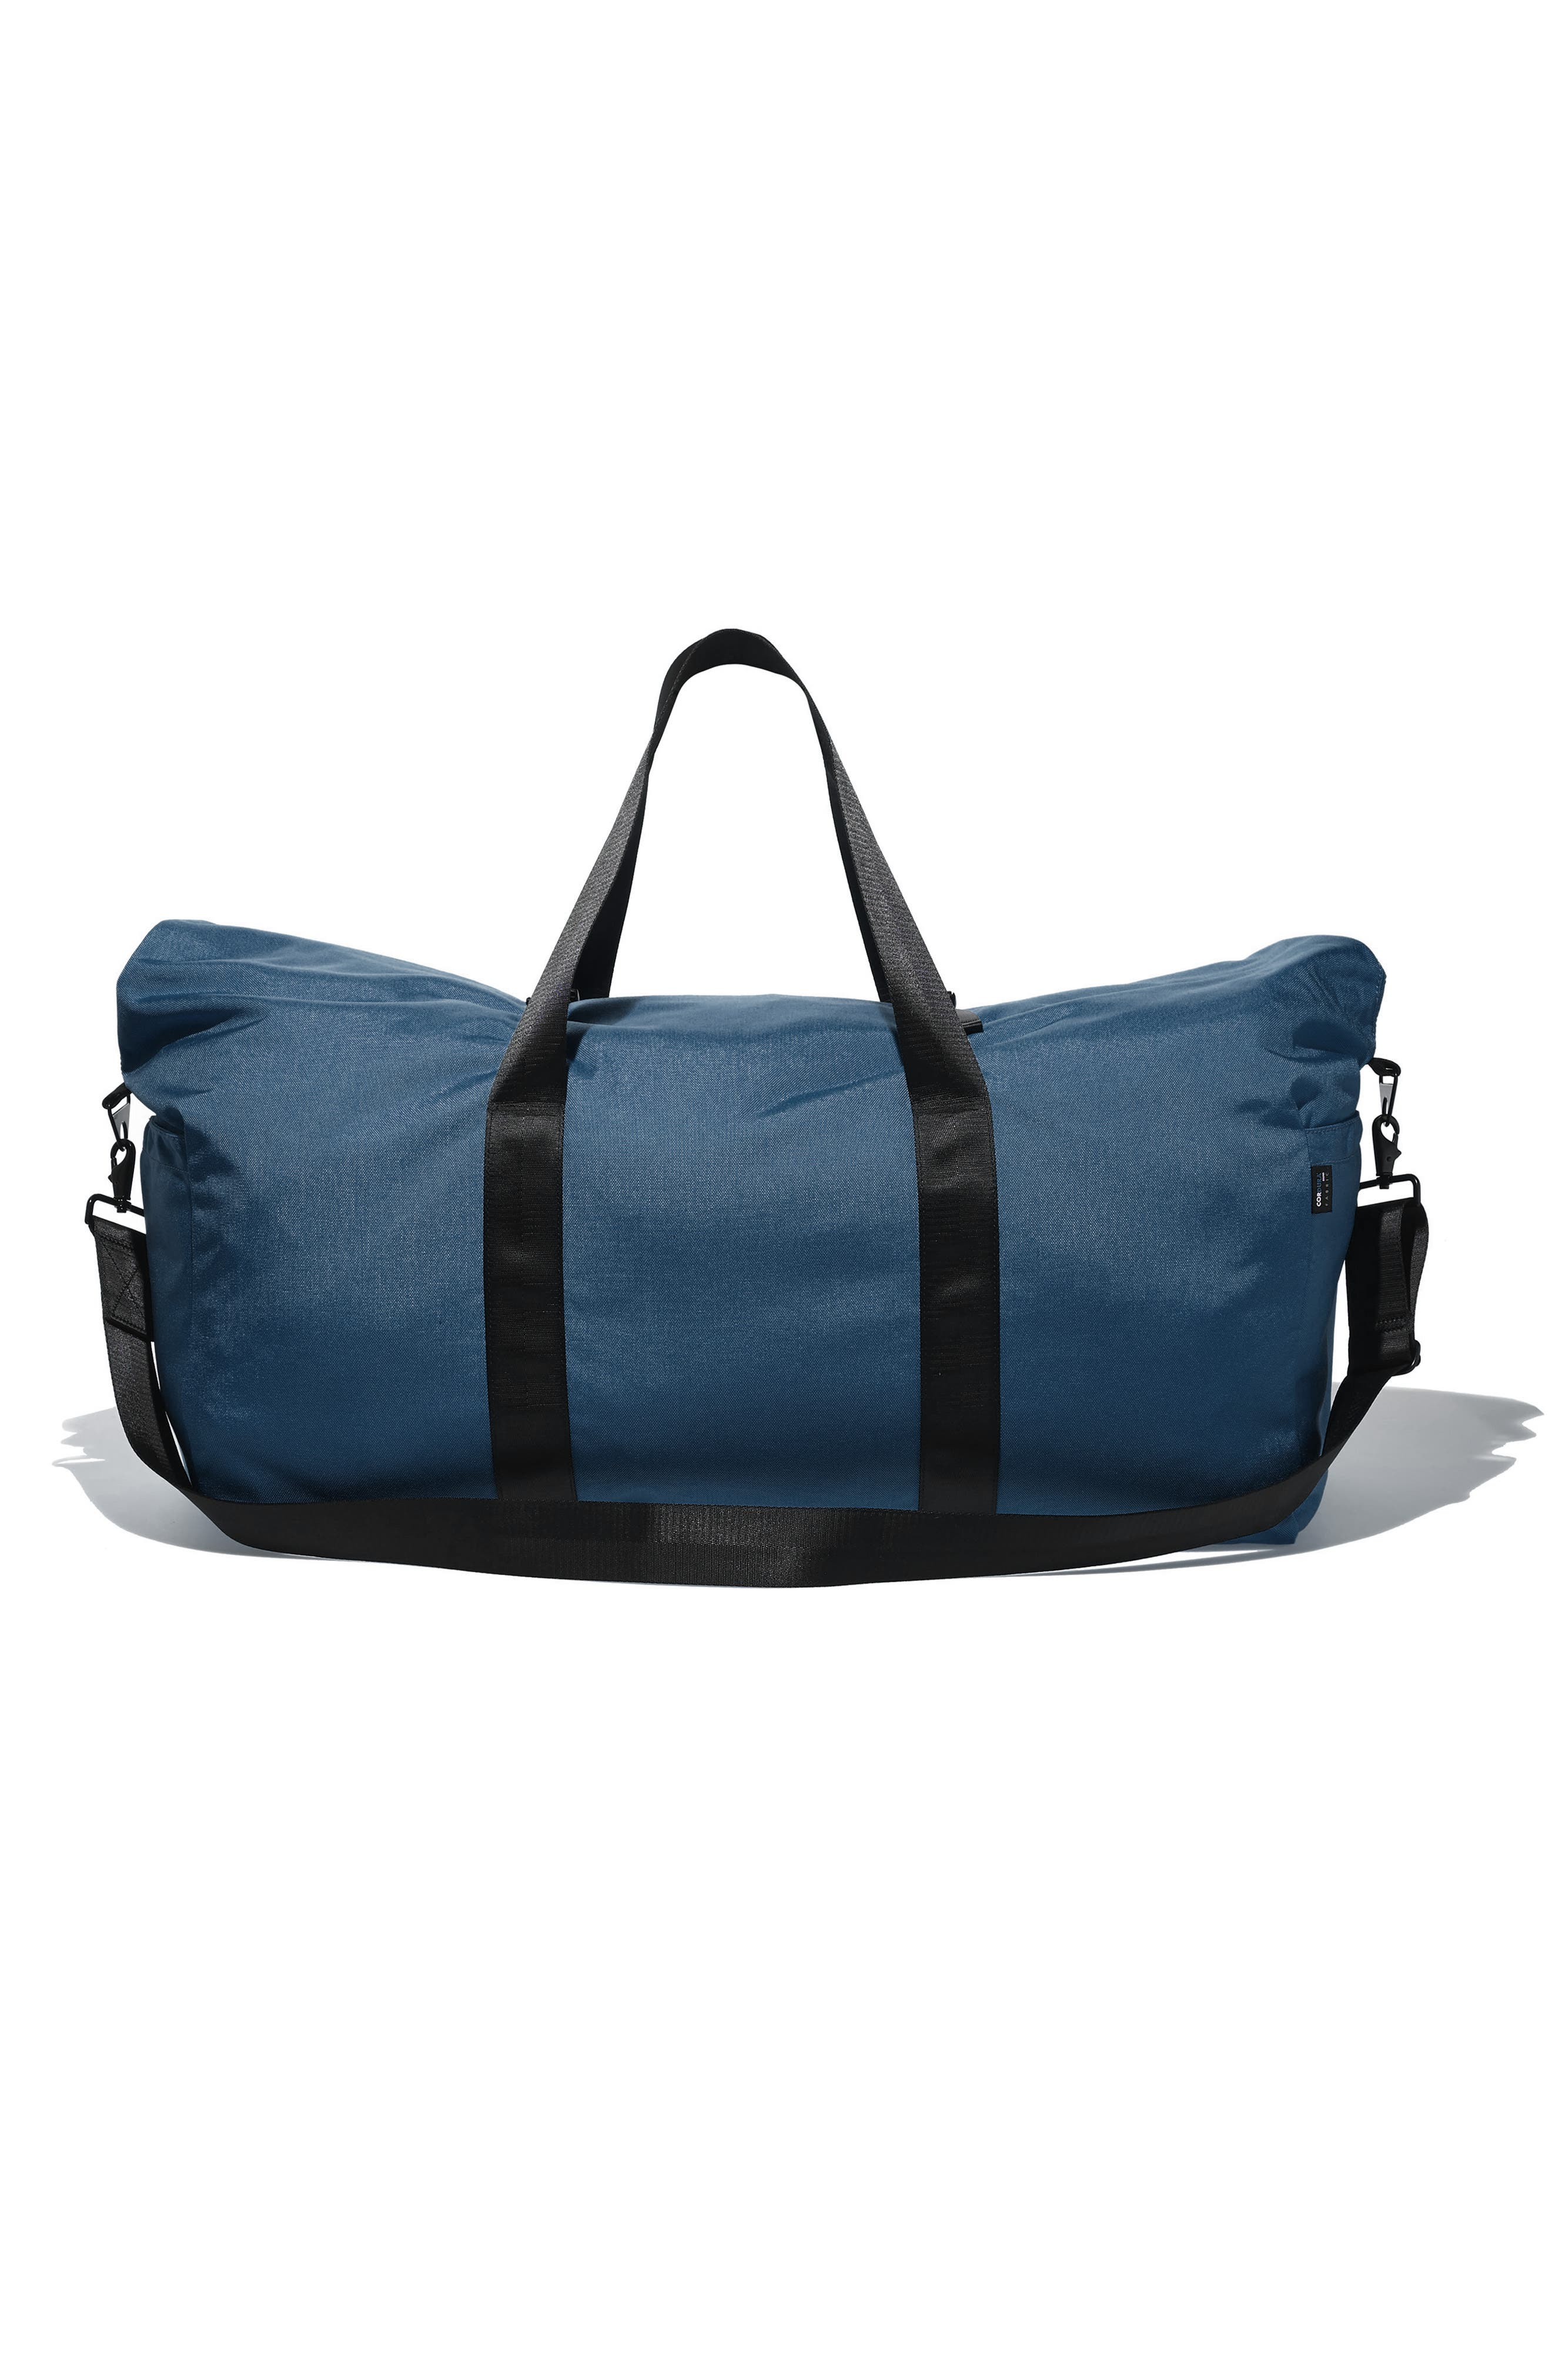 SWS 100L Roll Top Duffel Bag,                             Alternate thumbnail 2, color,                             NAVY